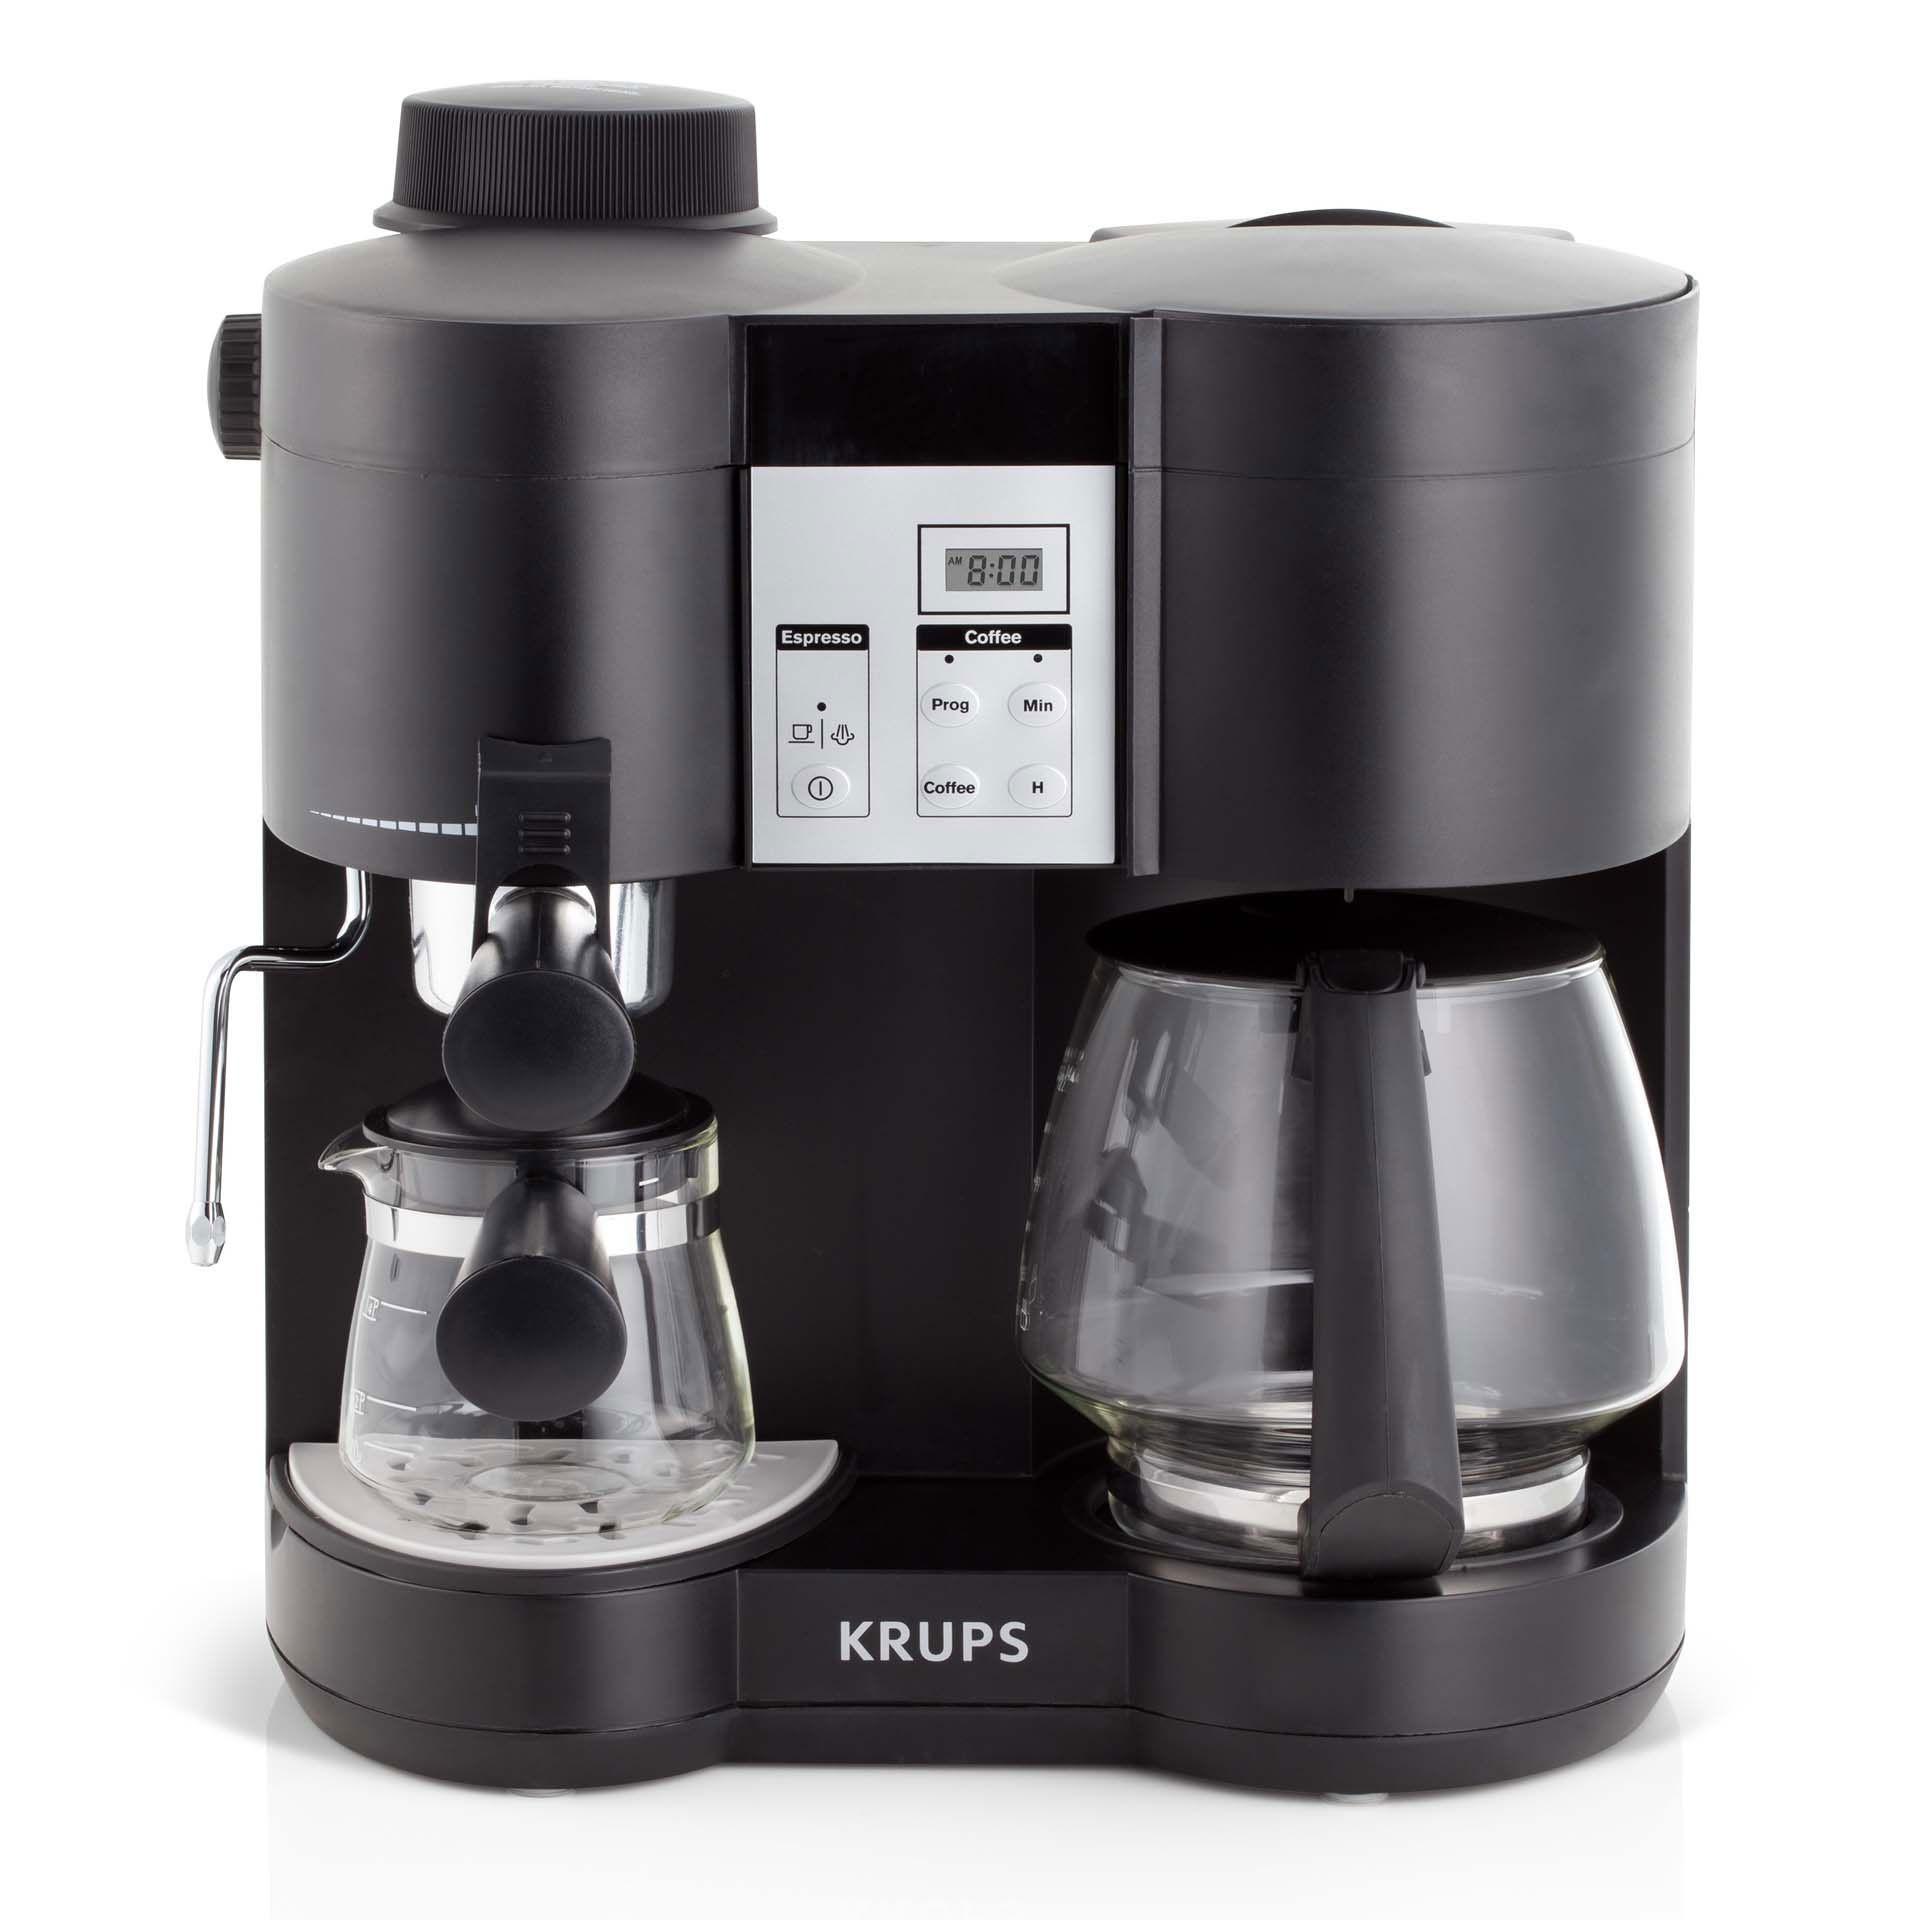 Krups Xp1600 Combi Steam Espresso Machine Review